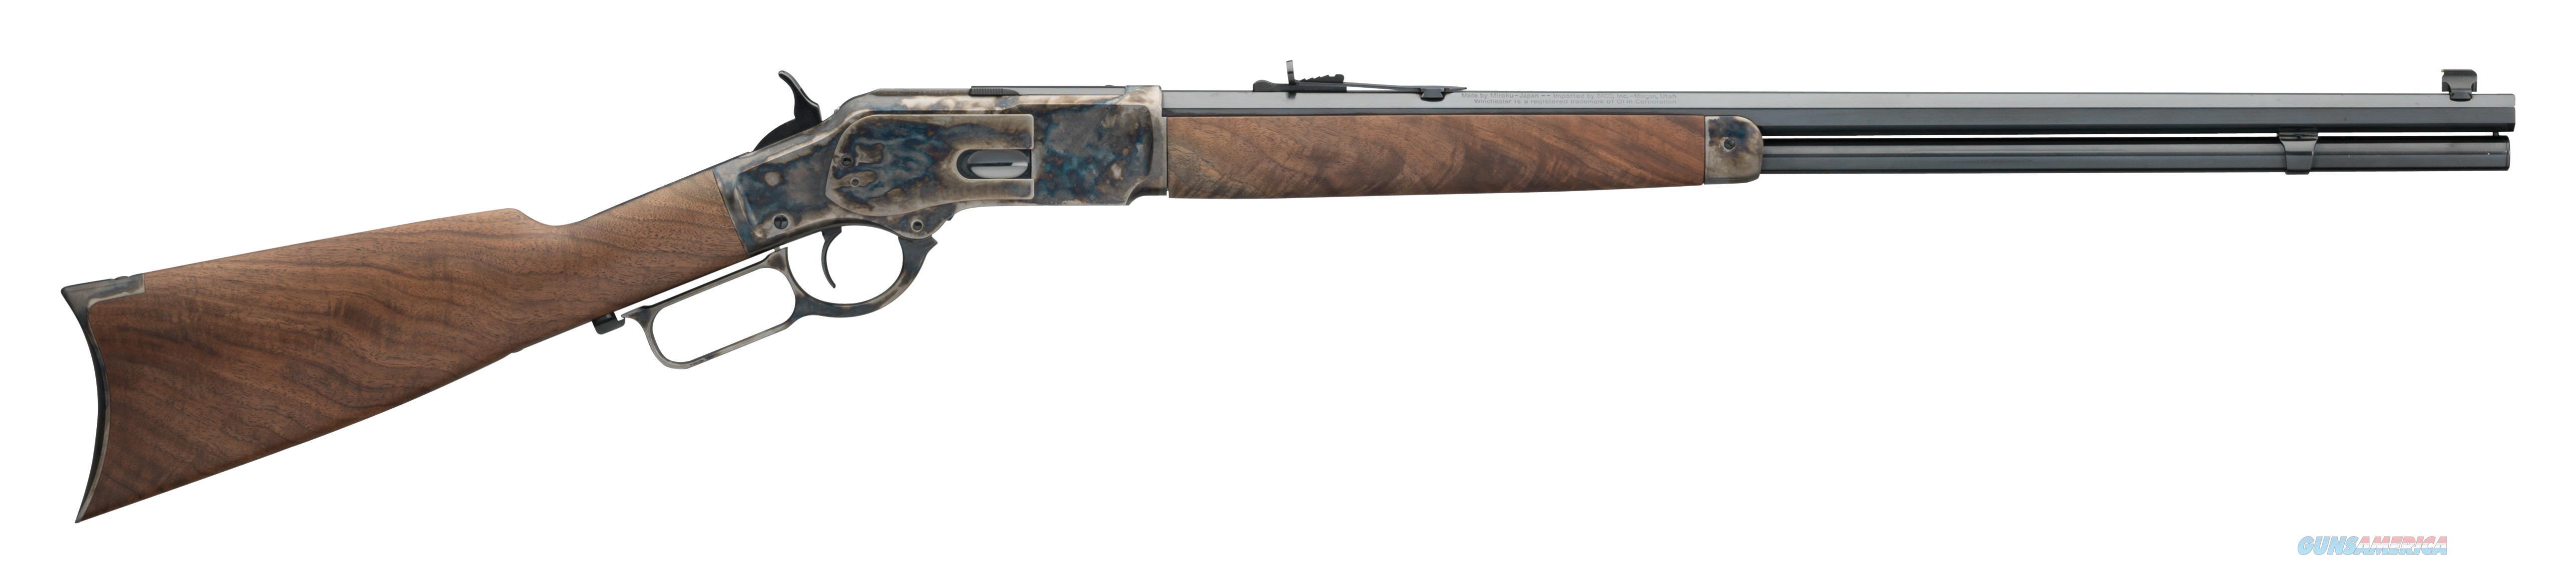 "Winchester Guns 534228141 1873 Sporter Lever 45 Colt (Lc) 24"" 14+1 Black Walnut Stk Blued Barrel/Case Hardened Receiver 534228141  Guns > Rifles > W Misc Rifles"